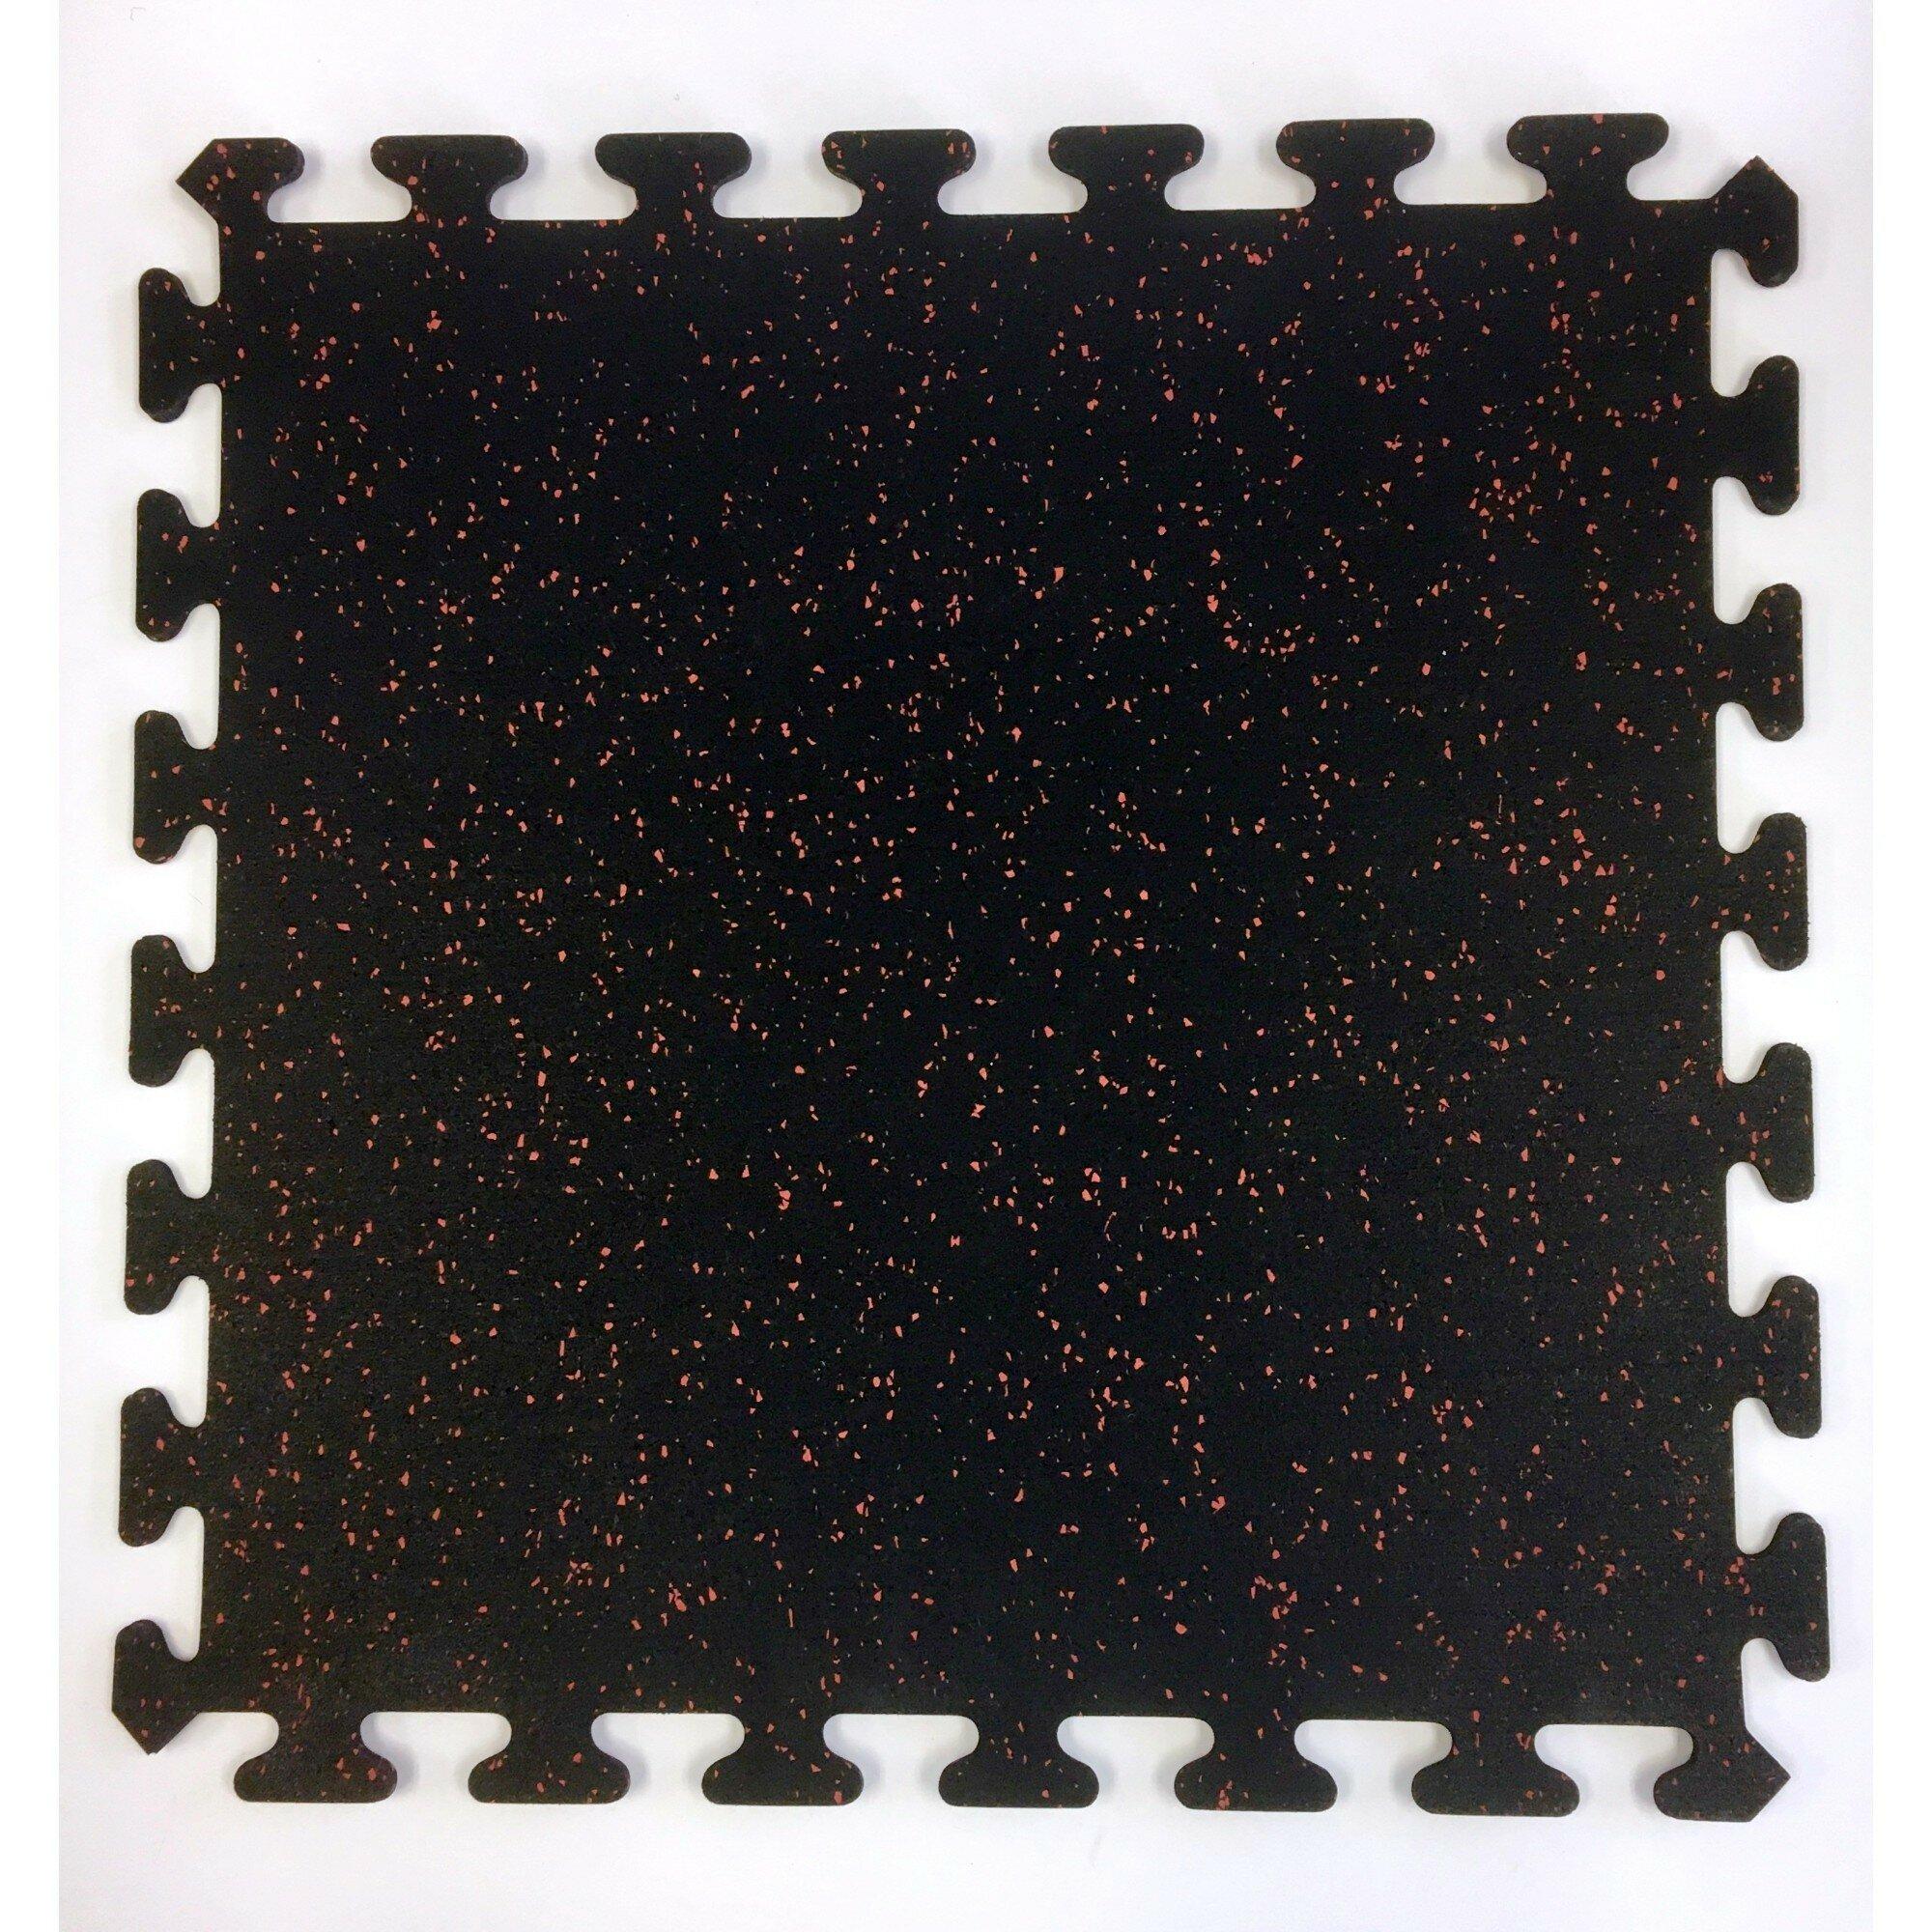 Flex Interlocking 5 16 Rubber Tiles